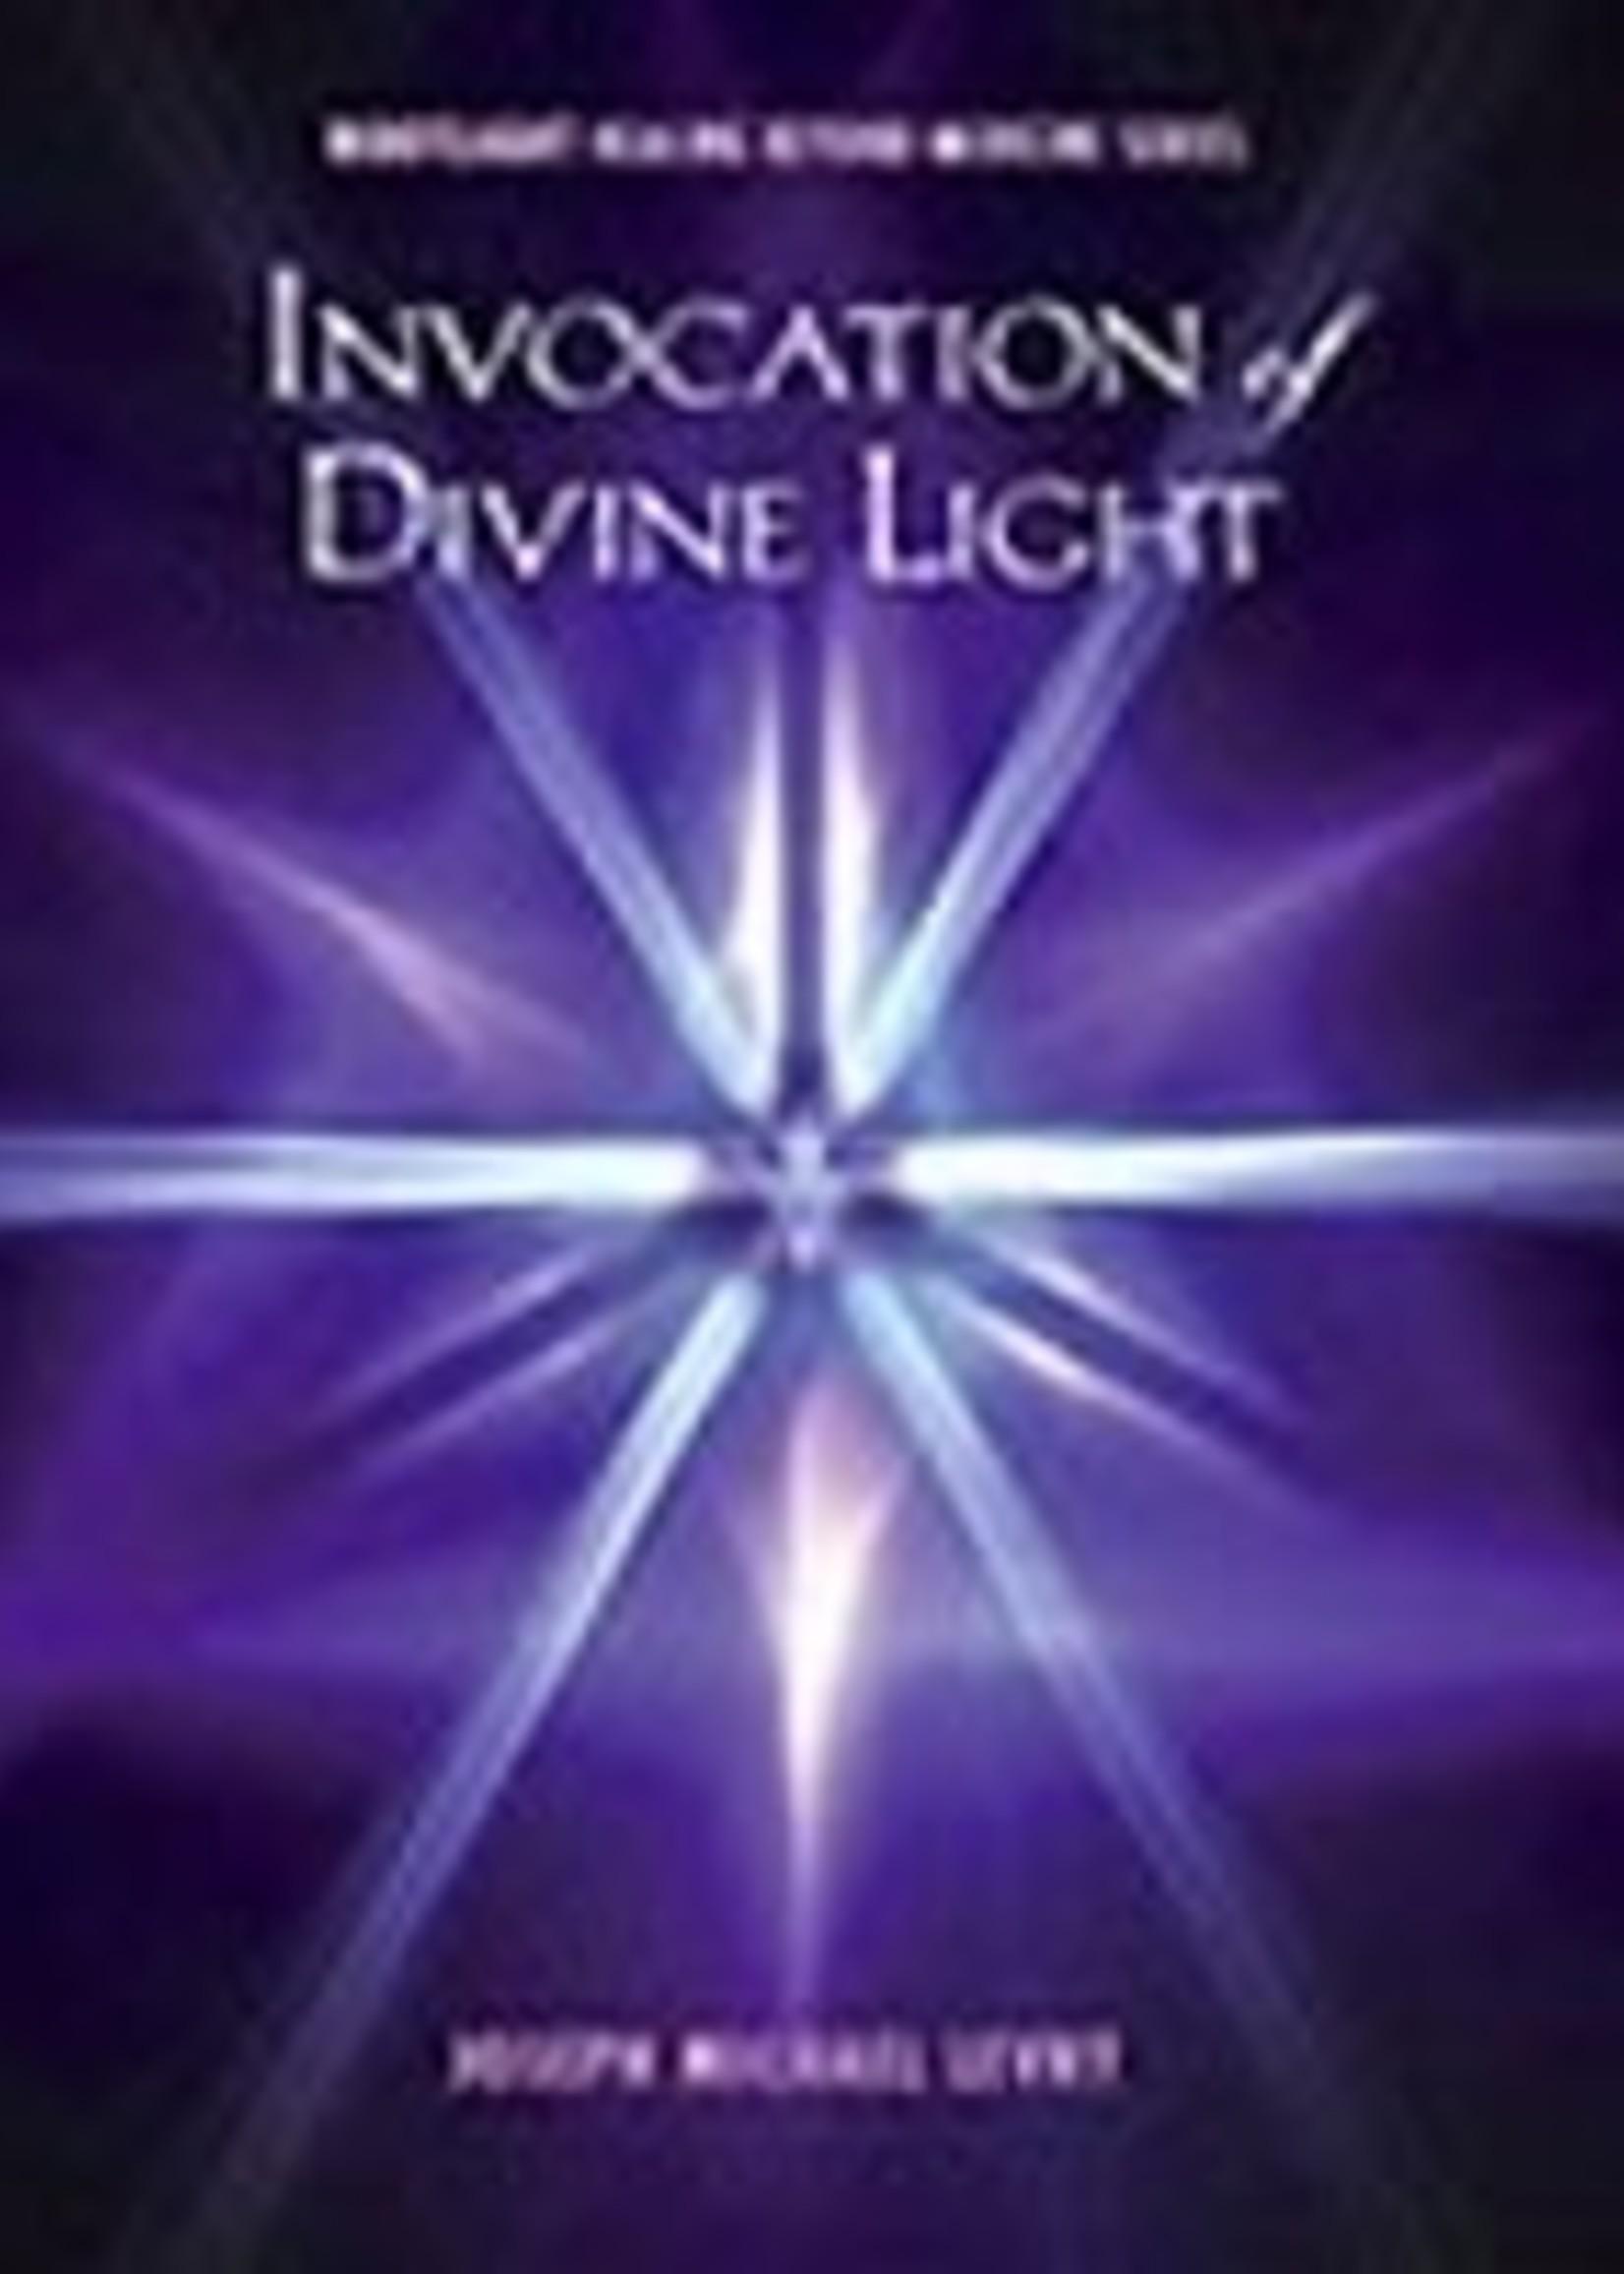 Dr Joseph Michael Levry (Gurunam ) Invocation of Divine Light